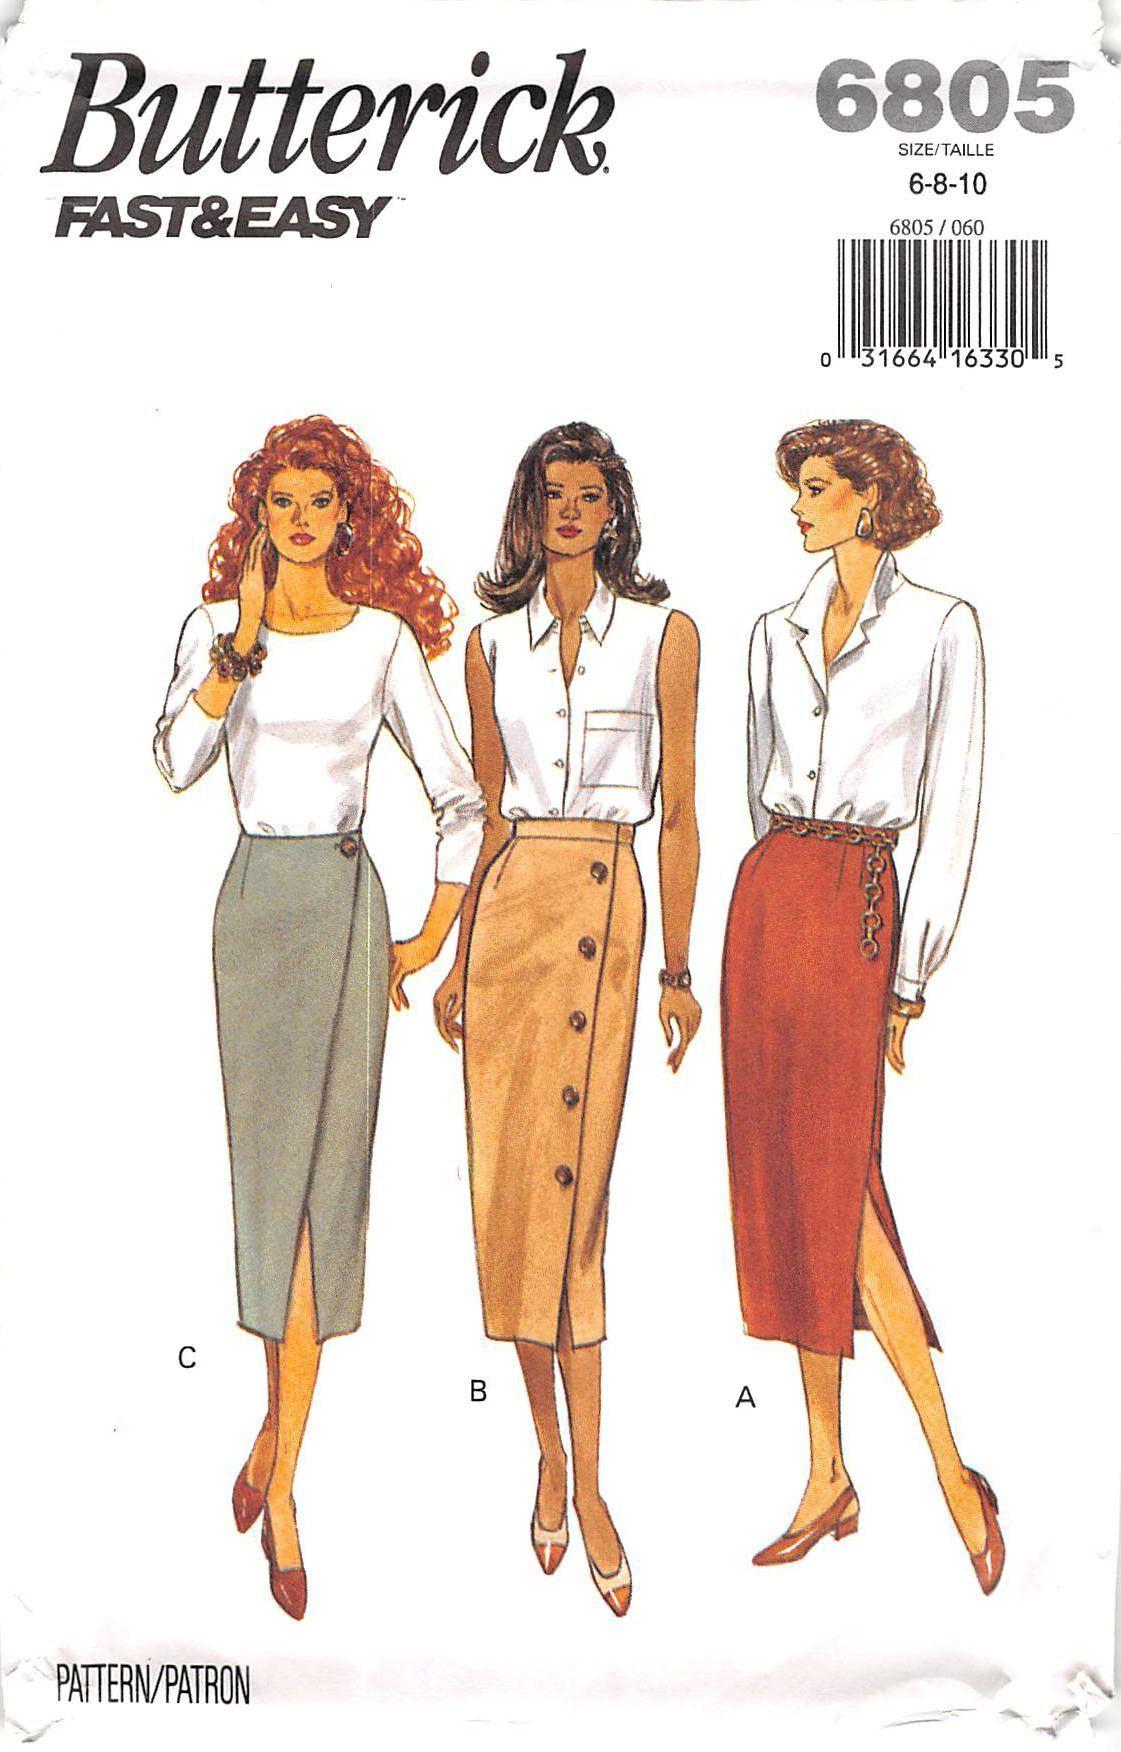 Butterick 6805 - from 1993 - uncut - misses skirt | Moda vestidos ...